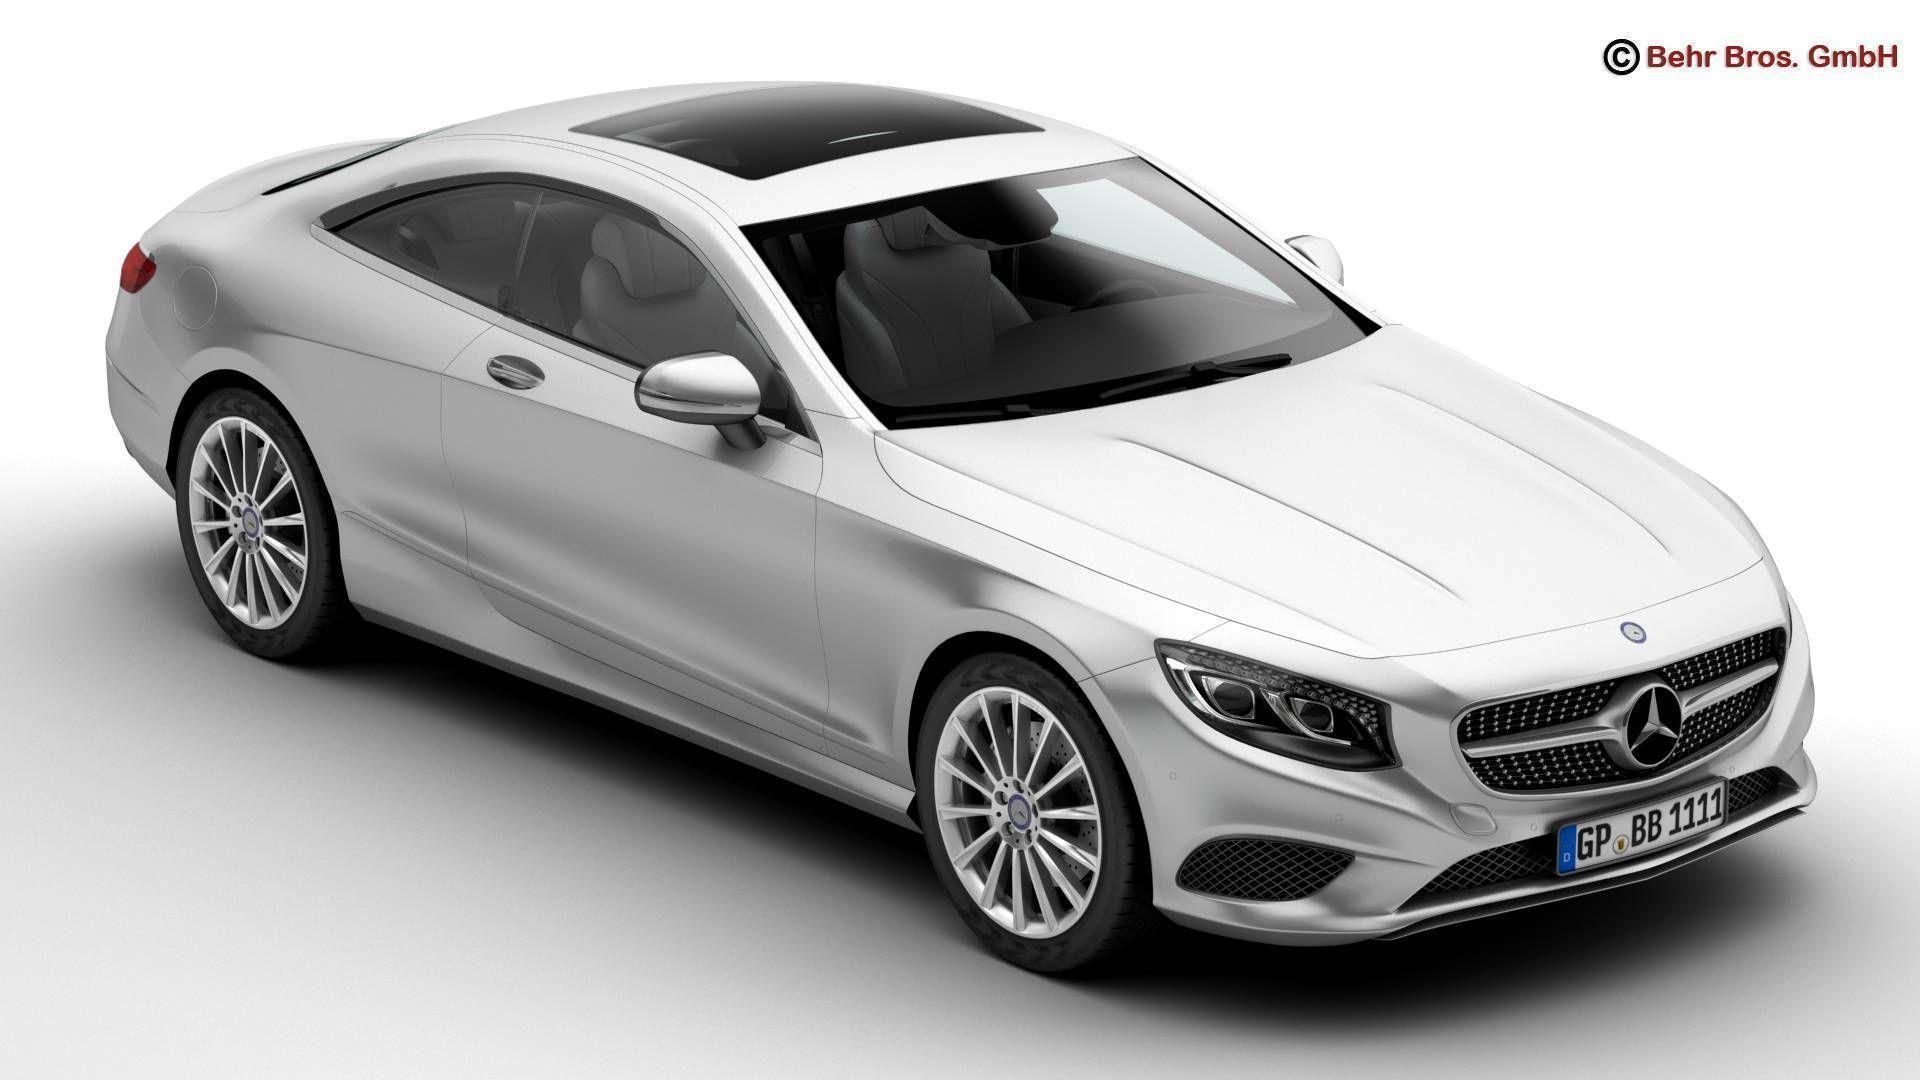 mercedes s class coupe 2015 2 headlight versions 3d model max obj 3ds fbx c4d lwo mercedes s class coupe 2015 2 headlight versions 3d model